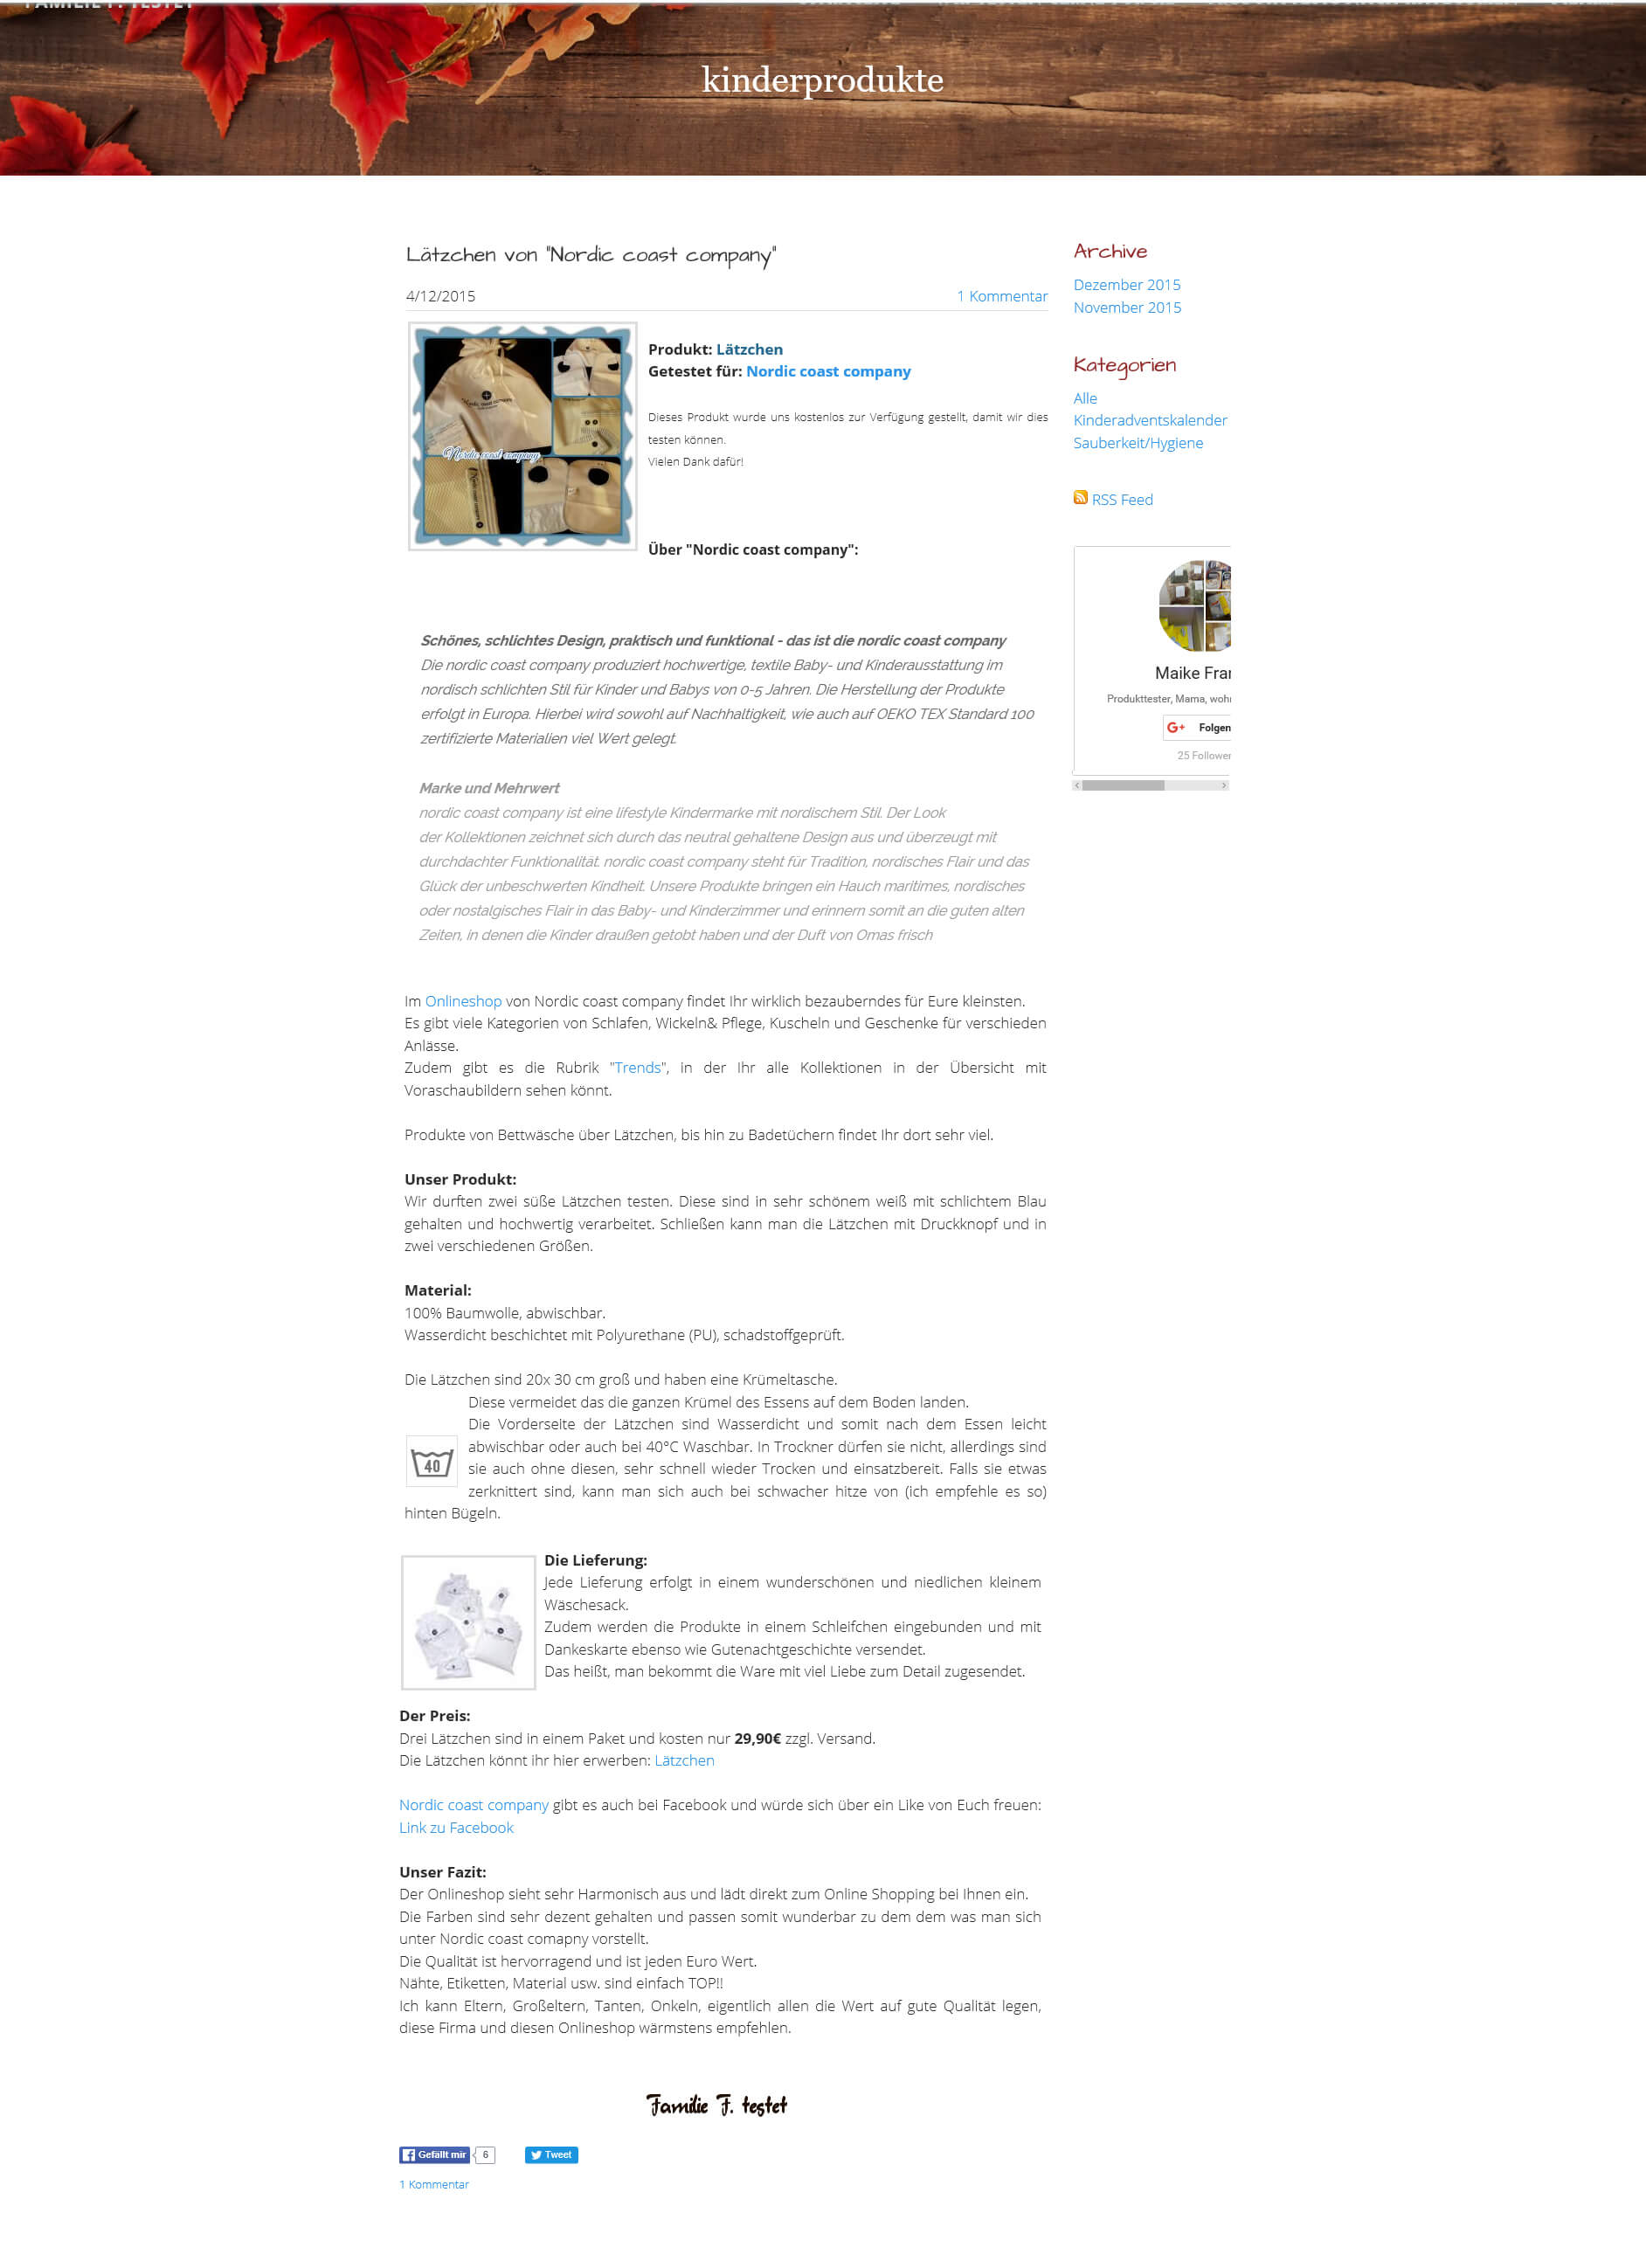 Blog vom 4